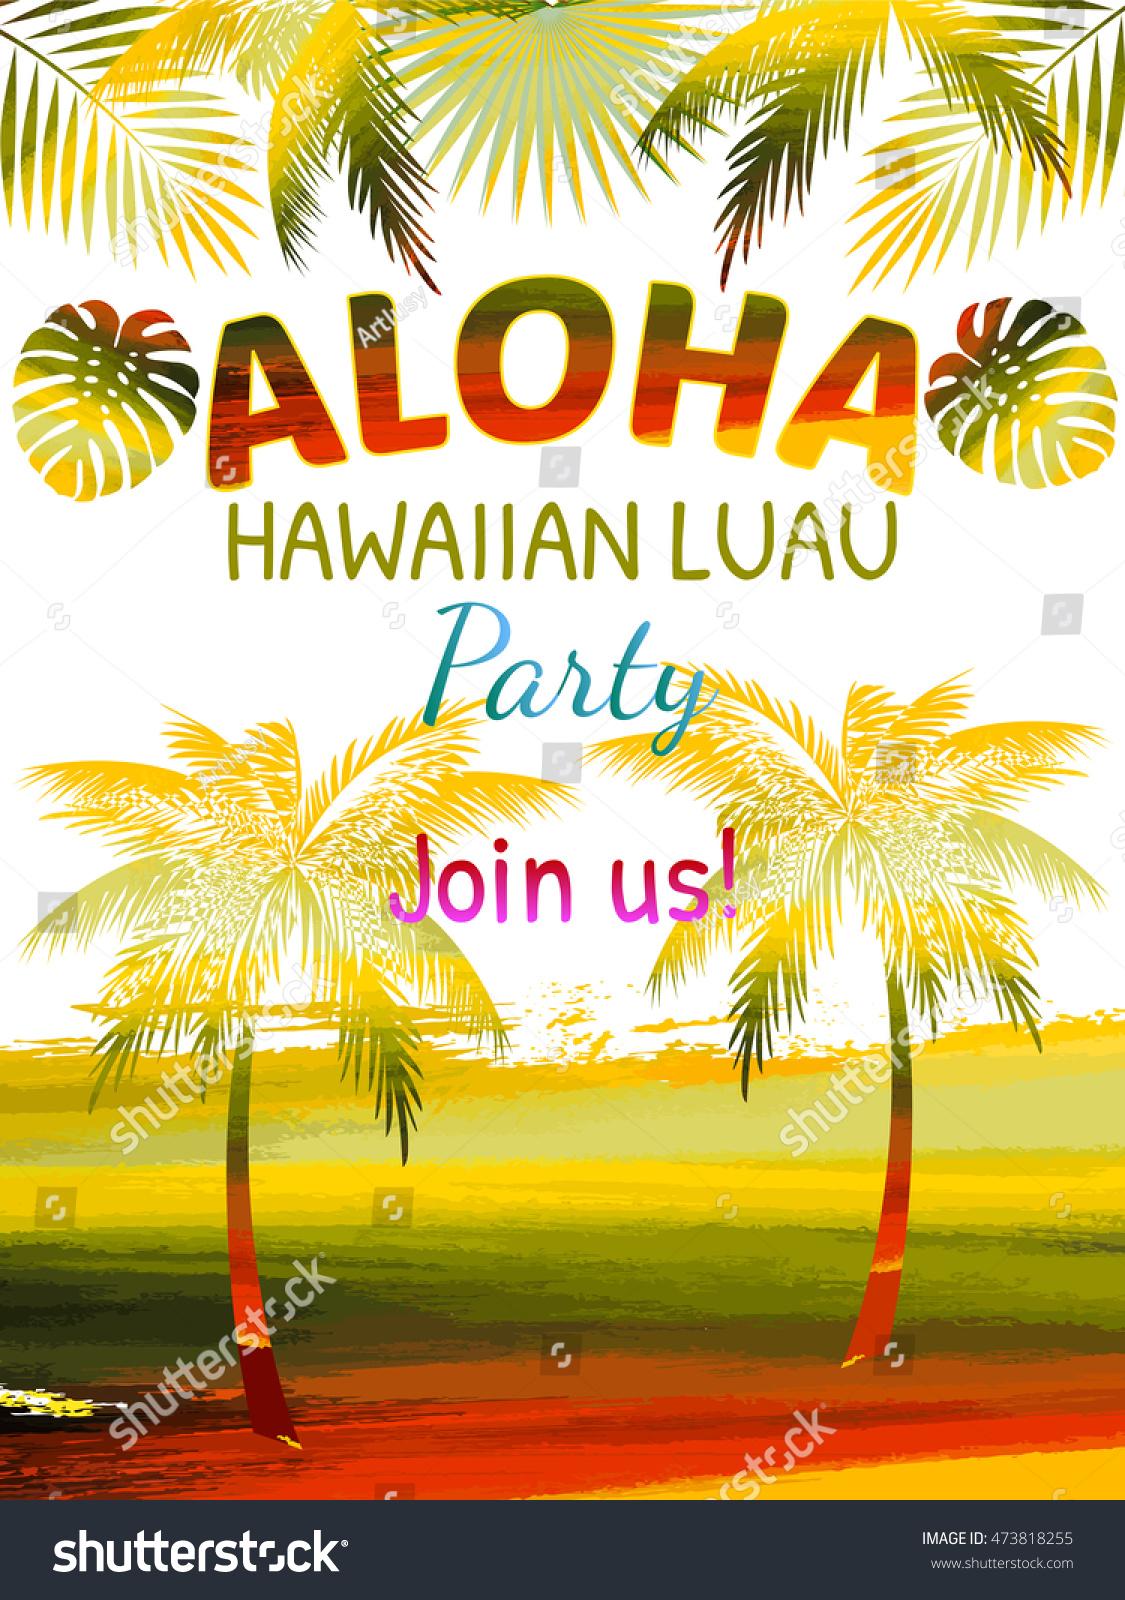 Aloha Hawaii Luau Party Invitation Leaves Stock Vector 473818255 ...